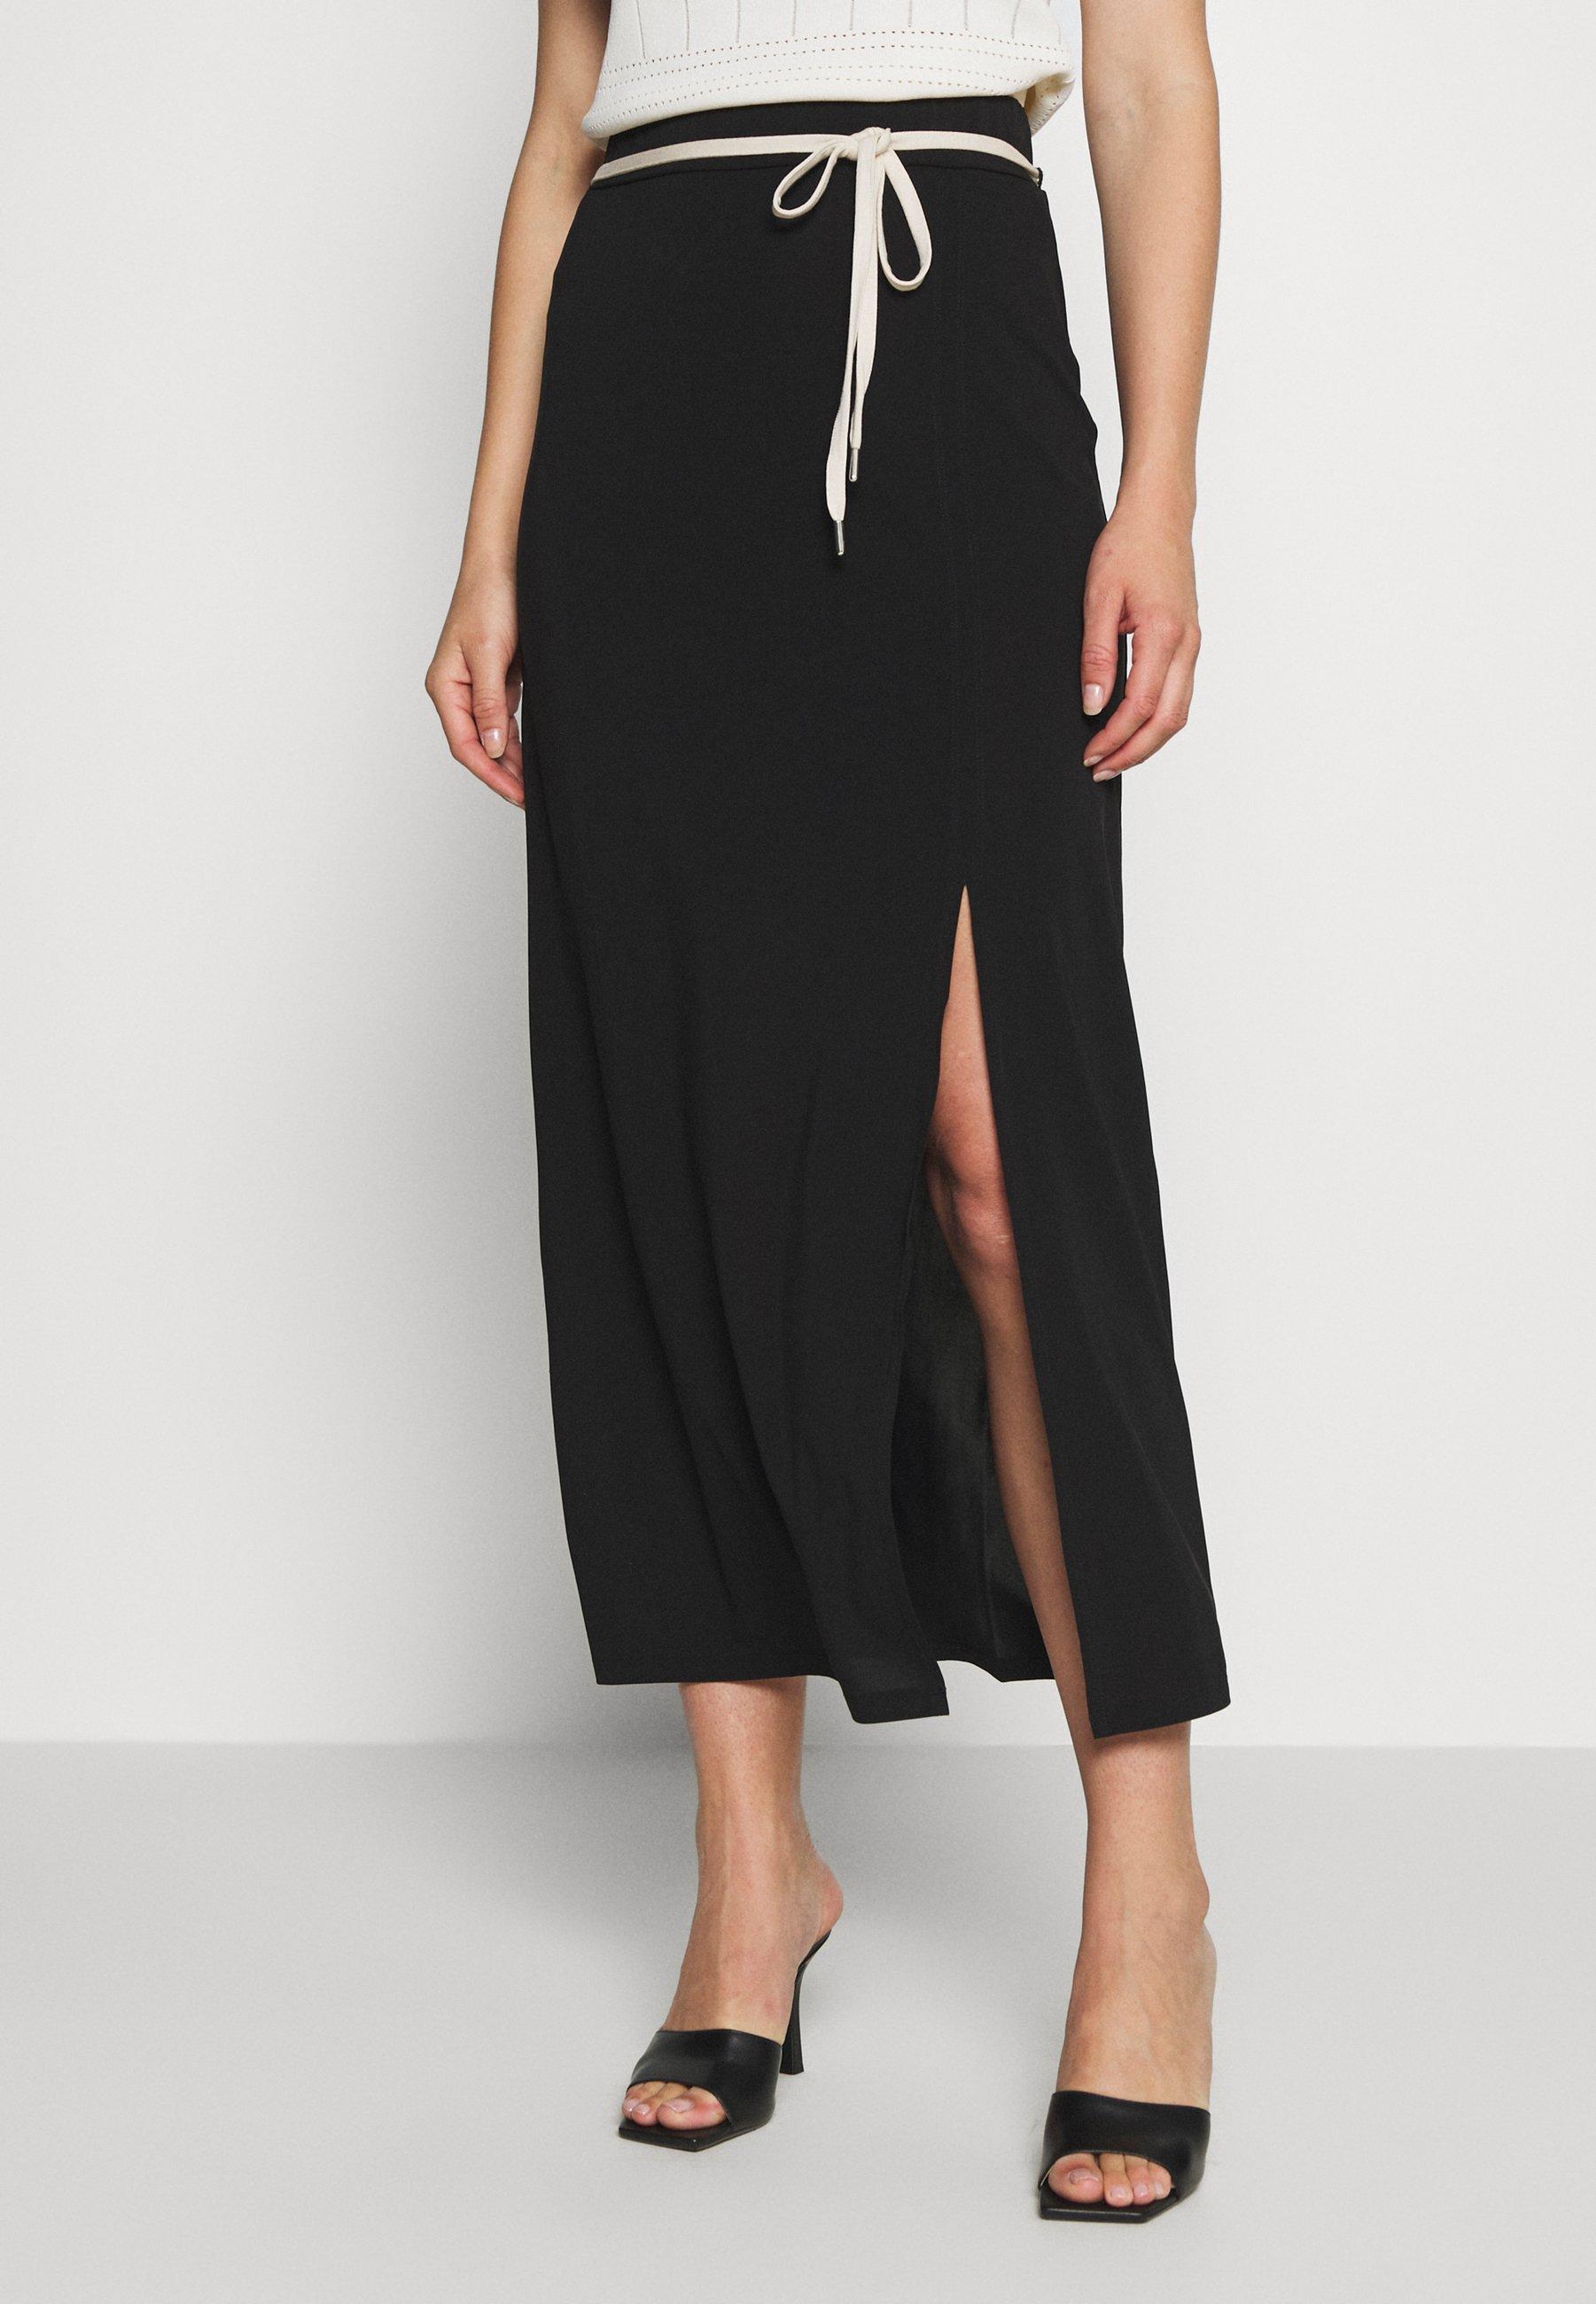 For Cheap Women's Clothing Expresso FERGIE Maxi skirt schwarz snuWNWnGZ